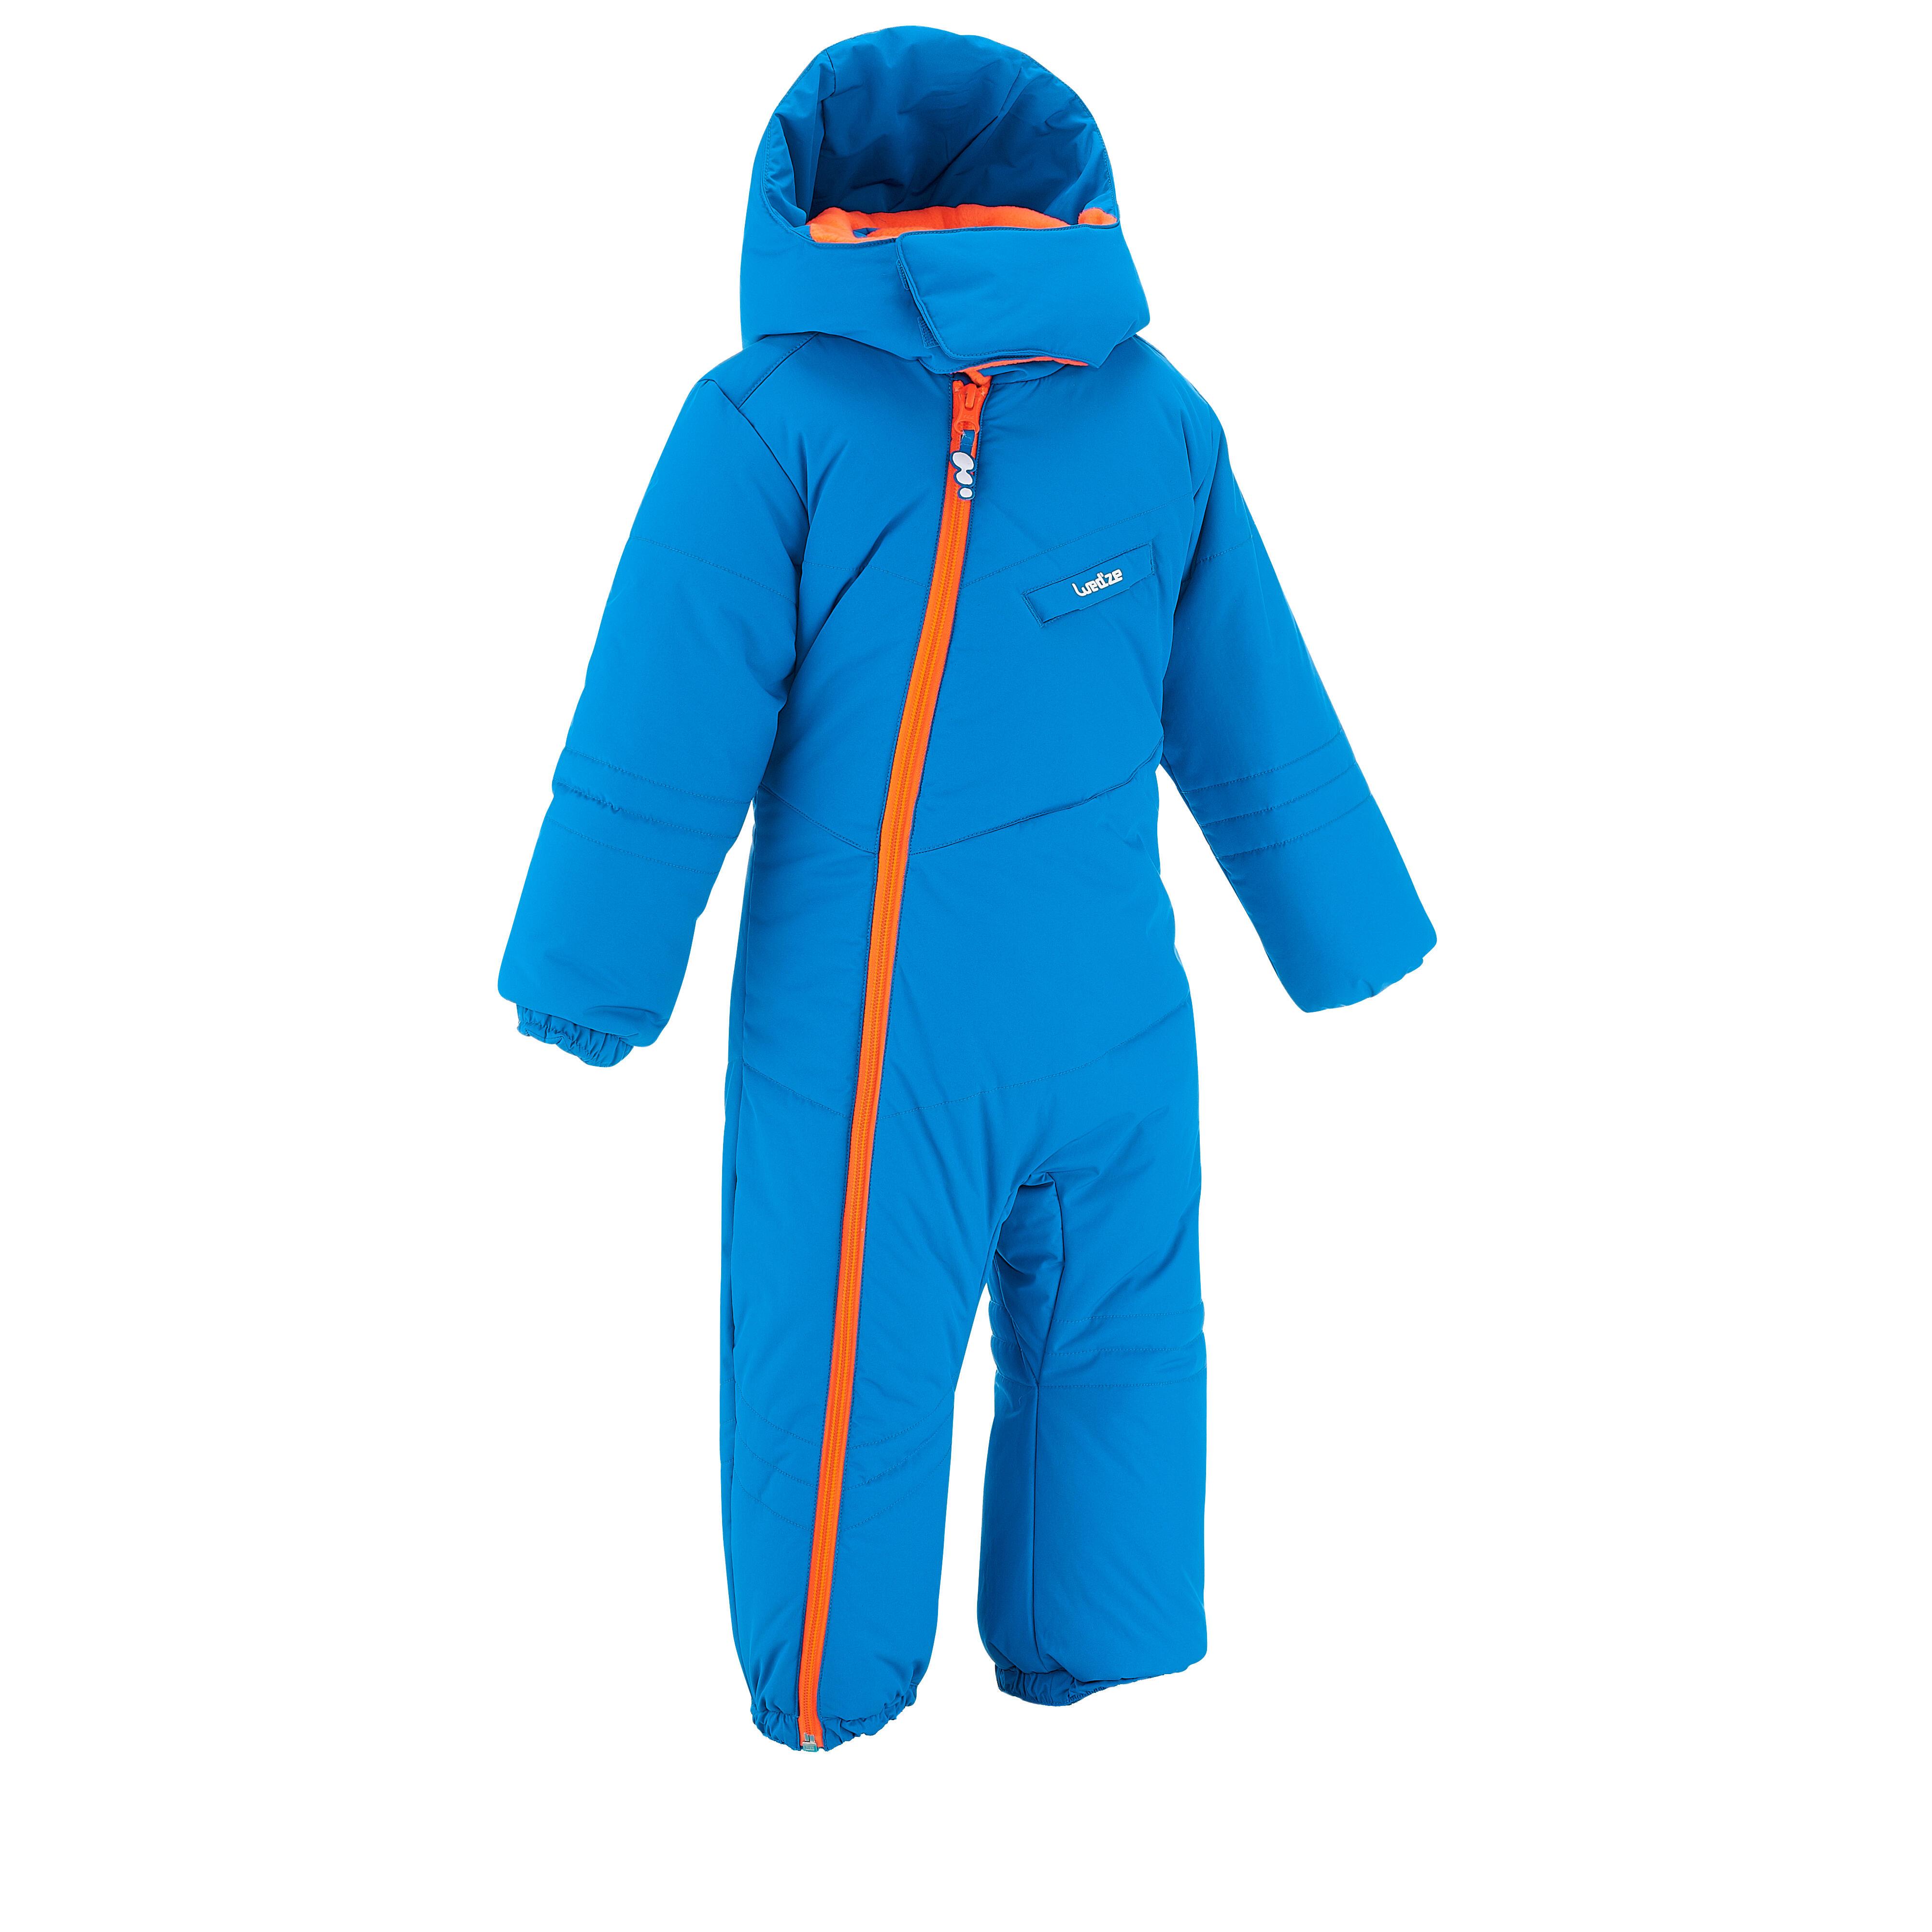 Wed'ze Sneeuwpak warm voor sleeën babyblauw thumbnail